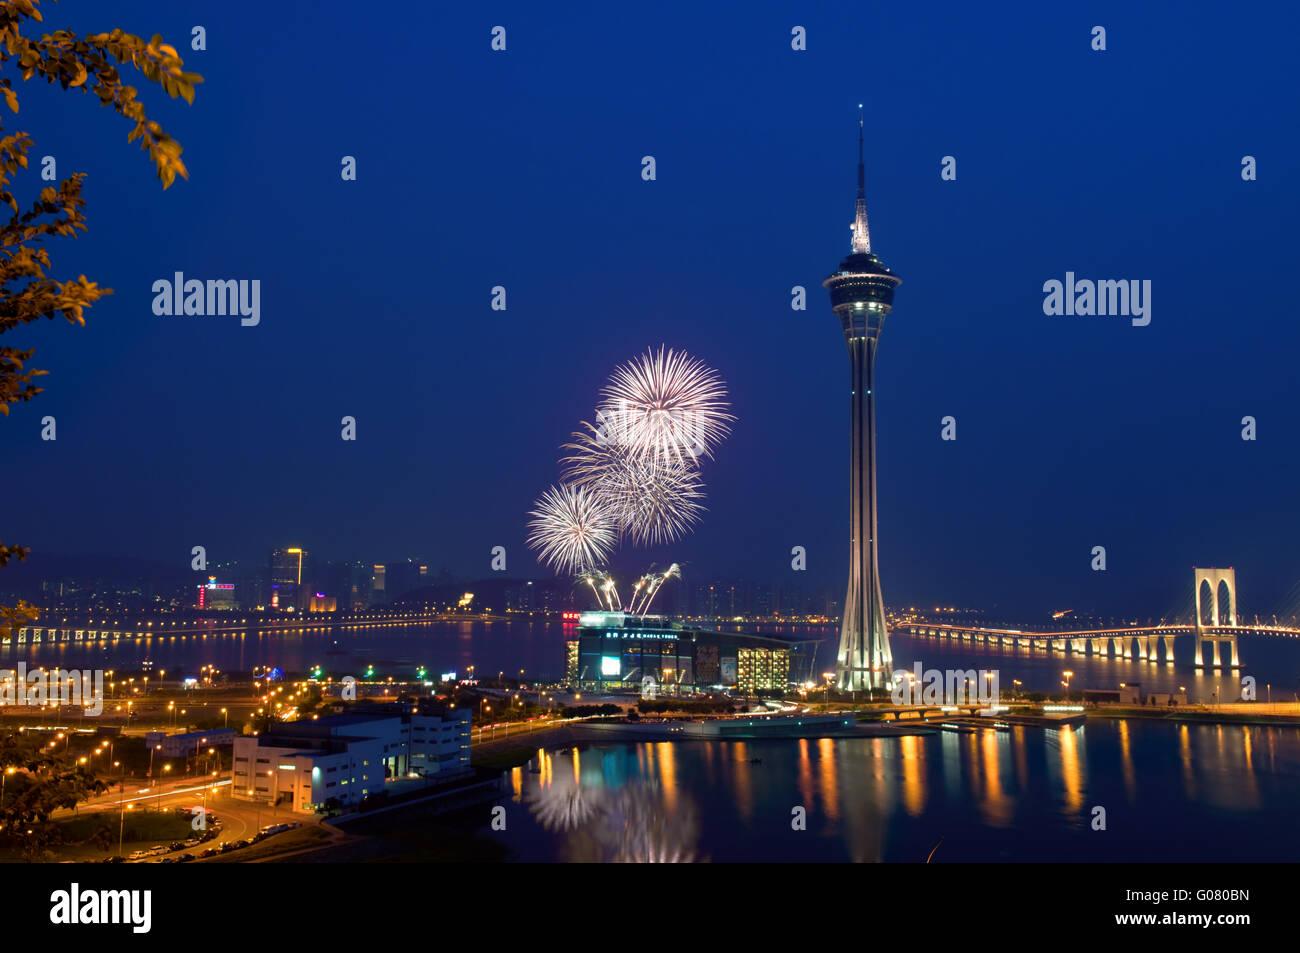 The 20th Macau International Fireworks Display Contest - Stock Image